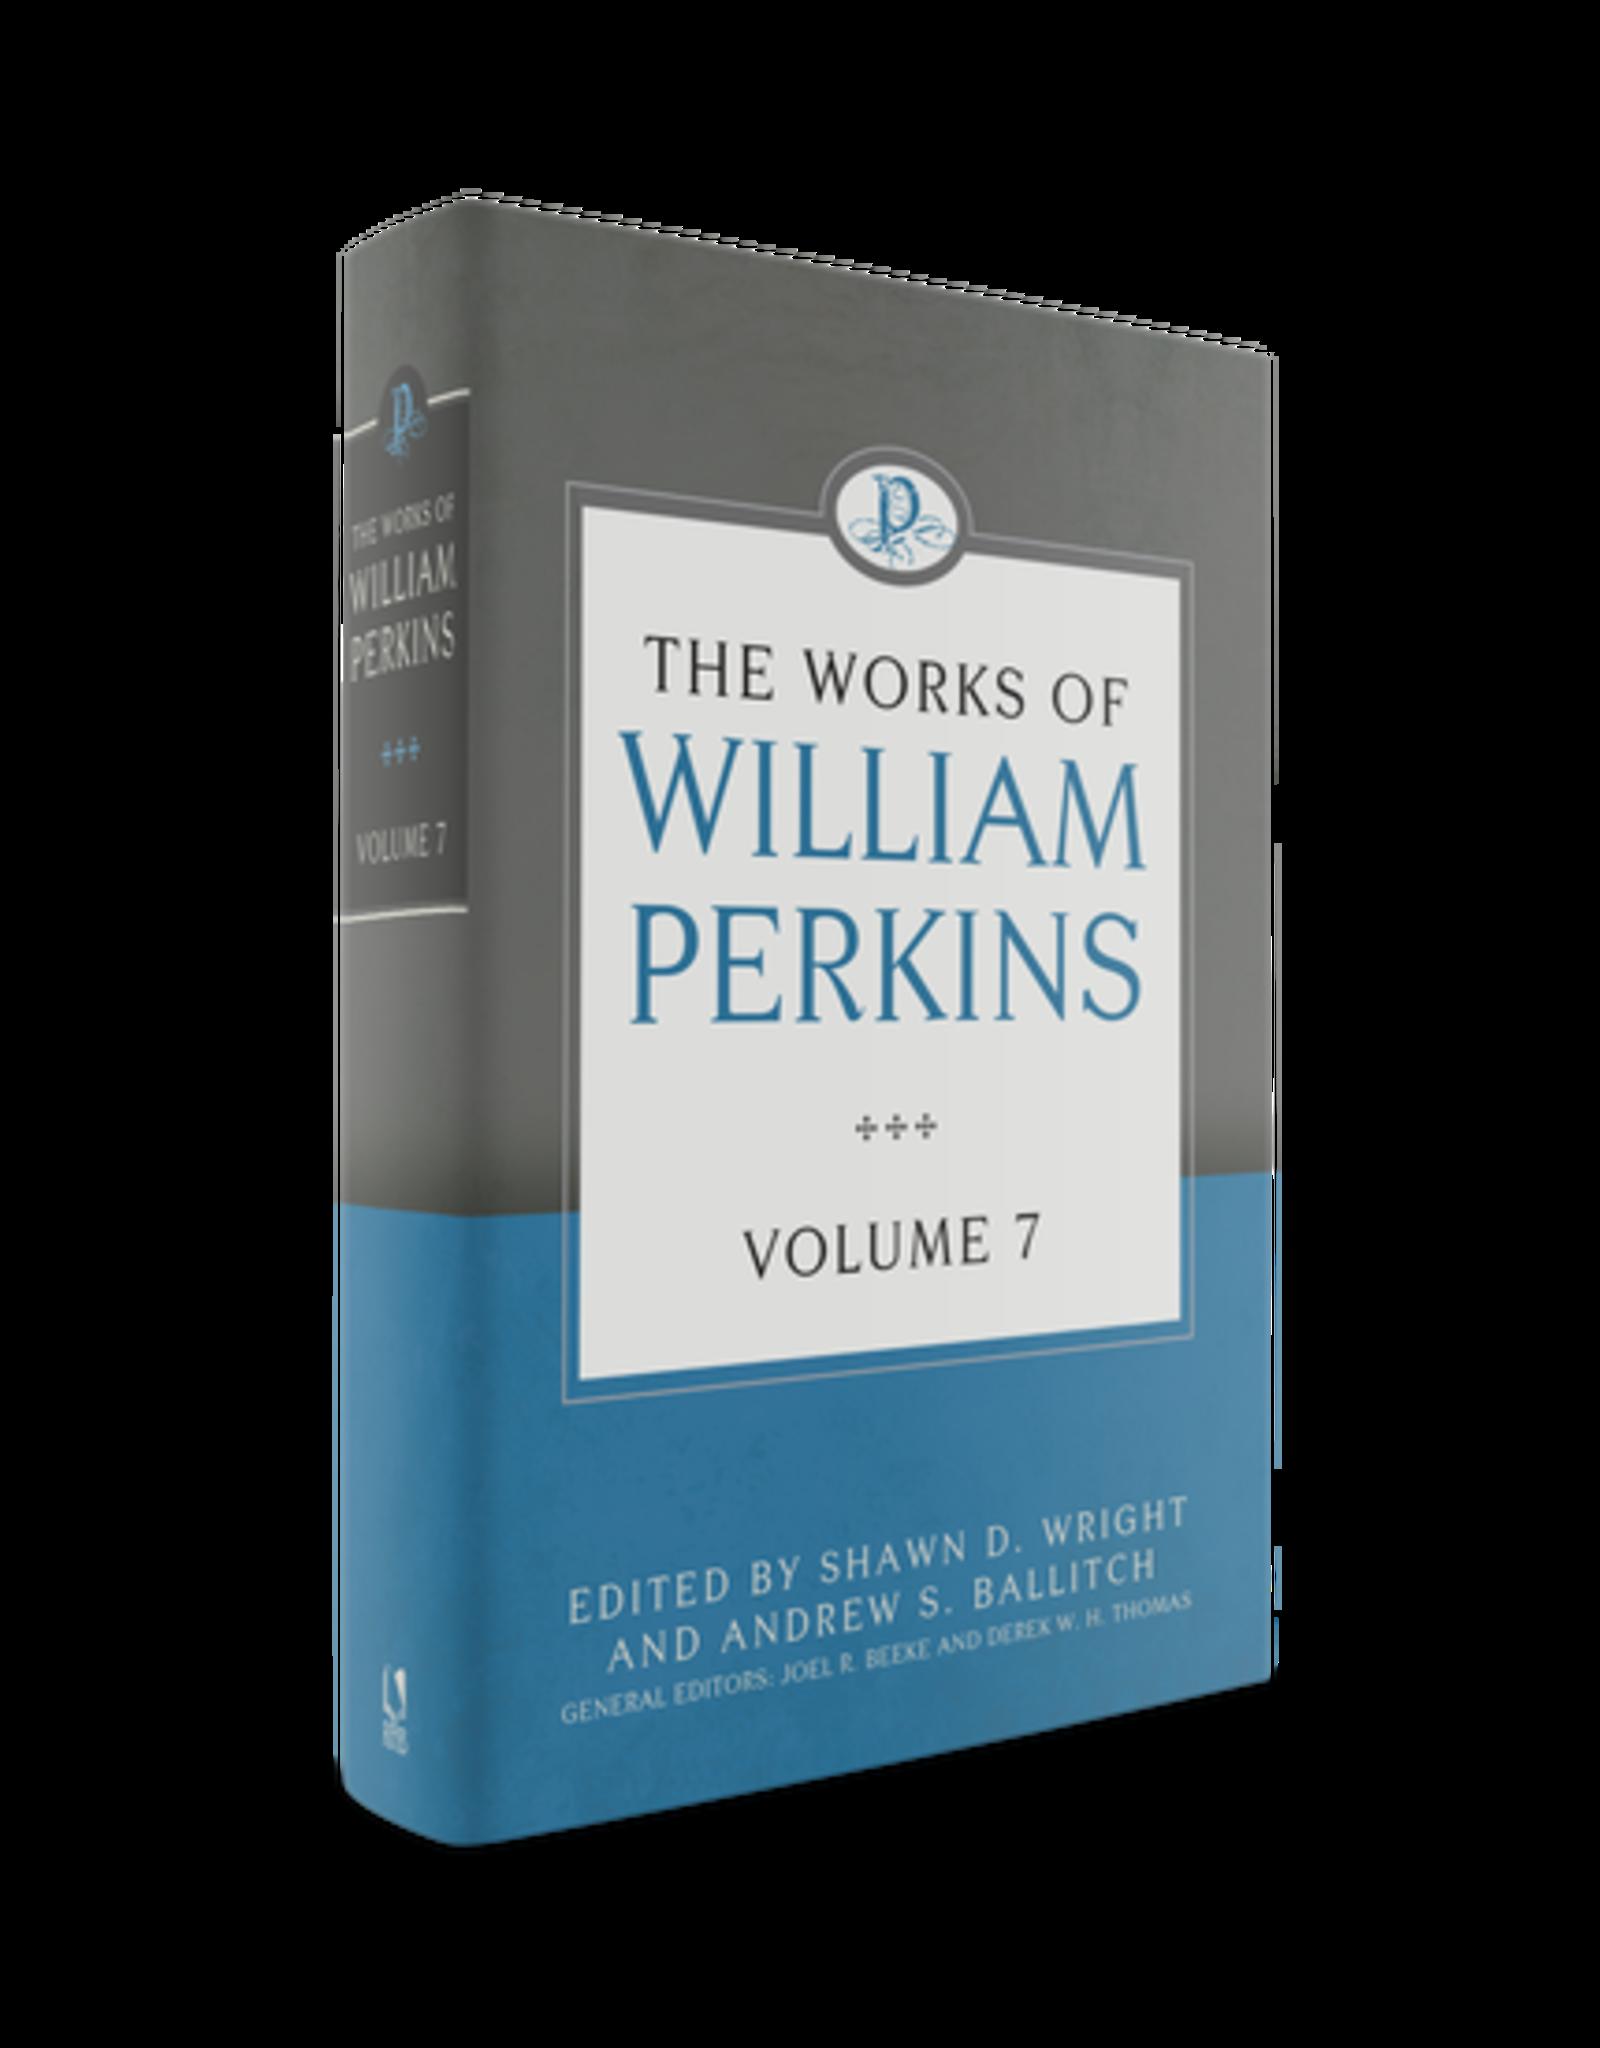 Perkins The works of William Perkins, Vol 7